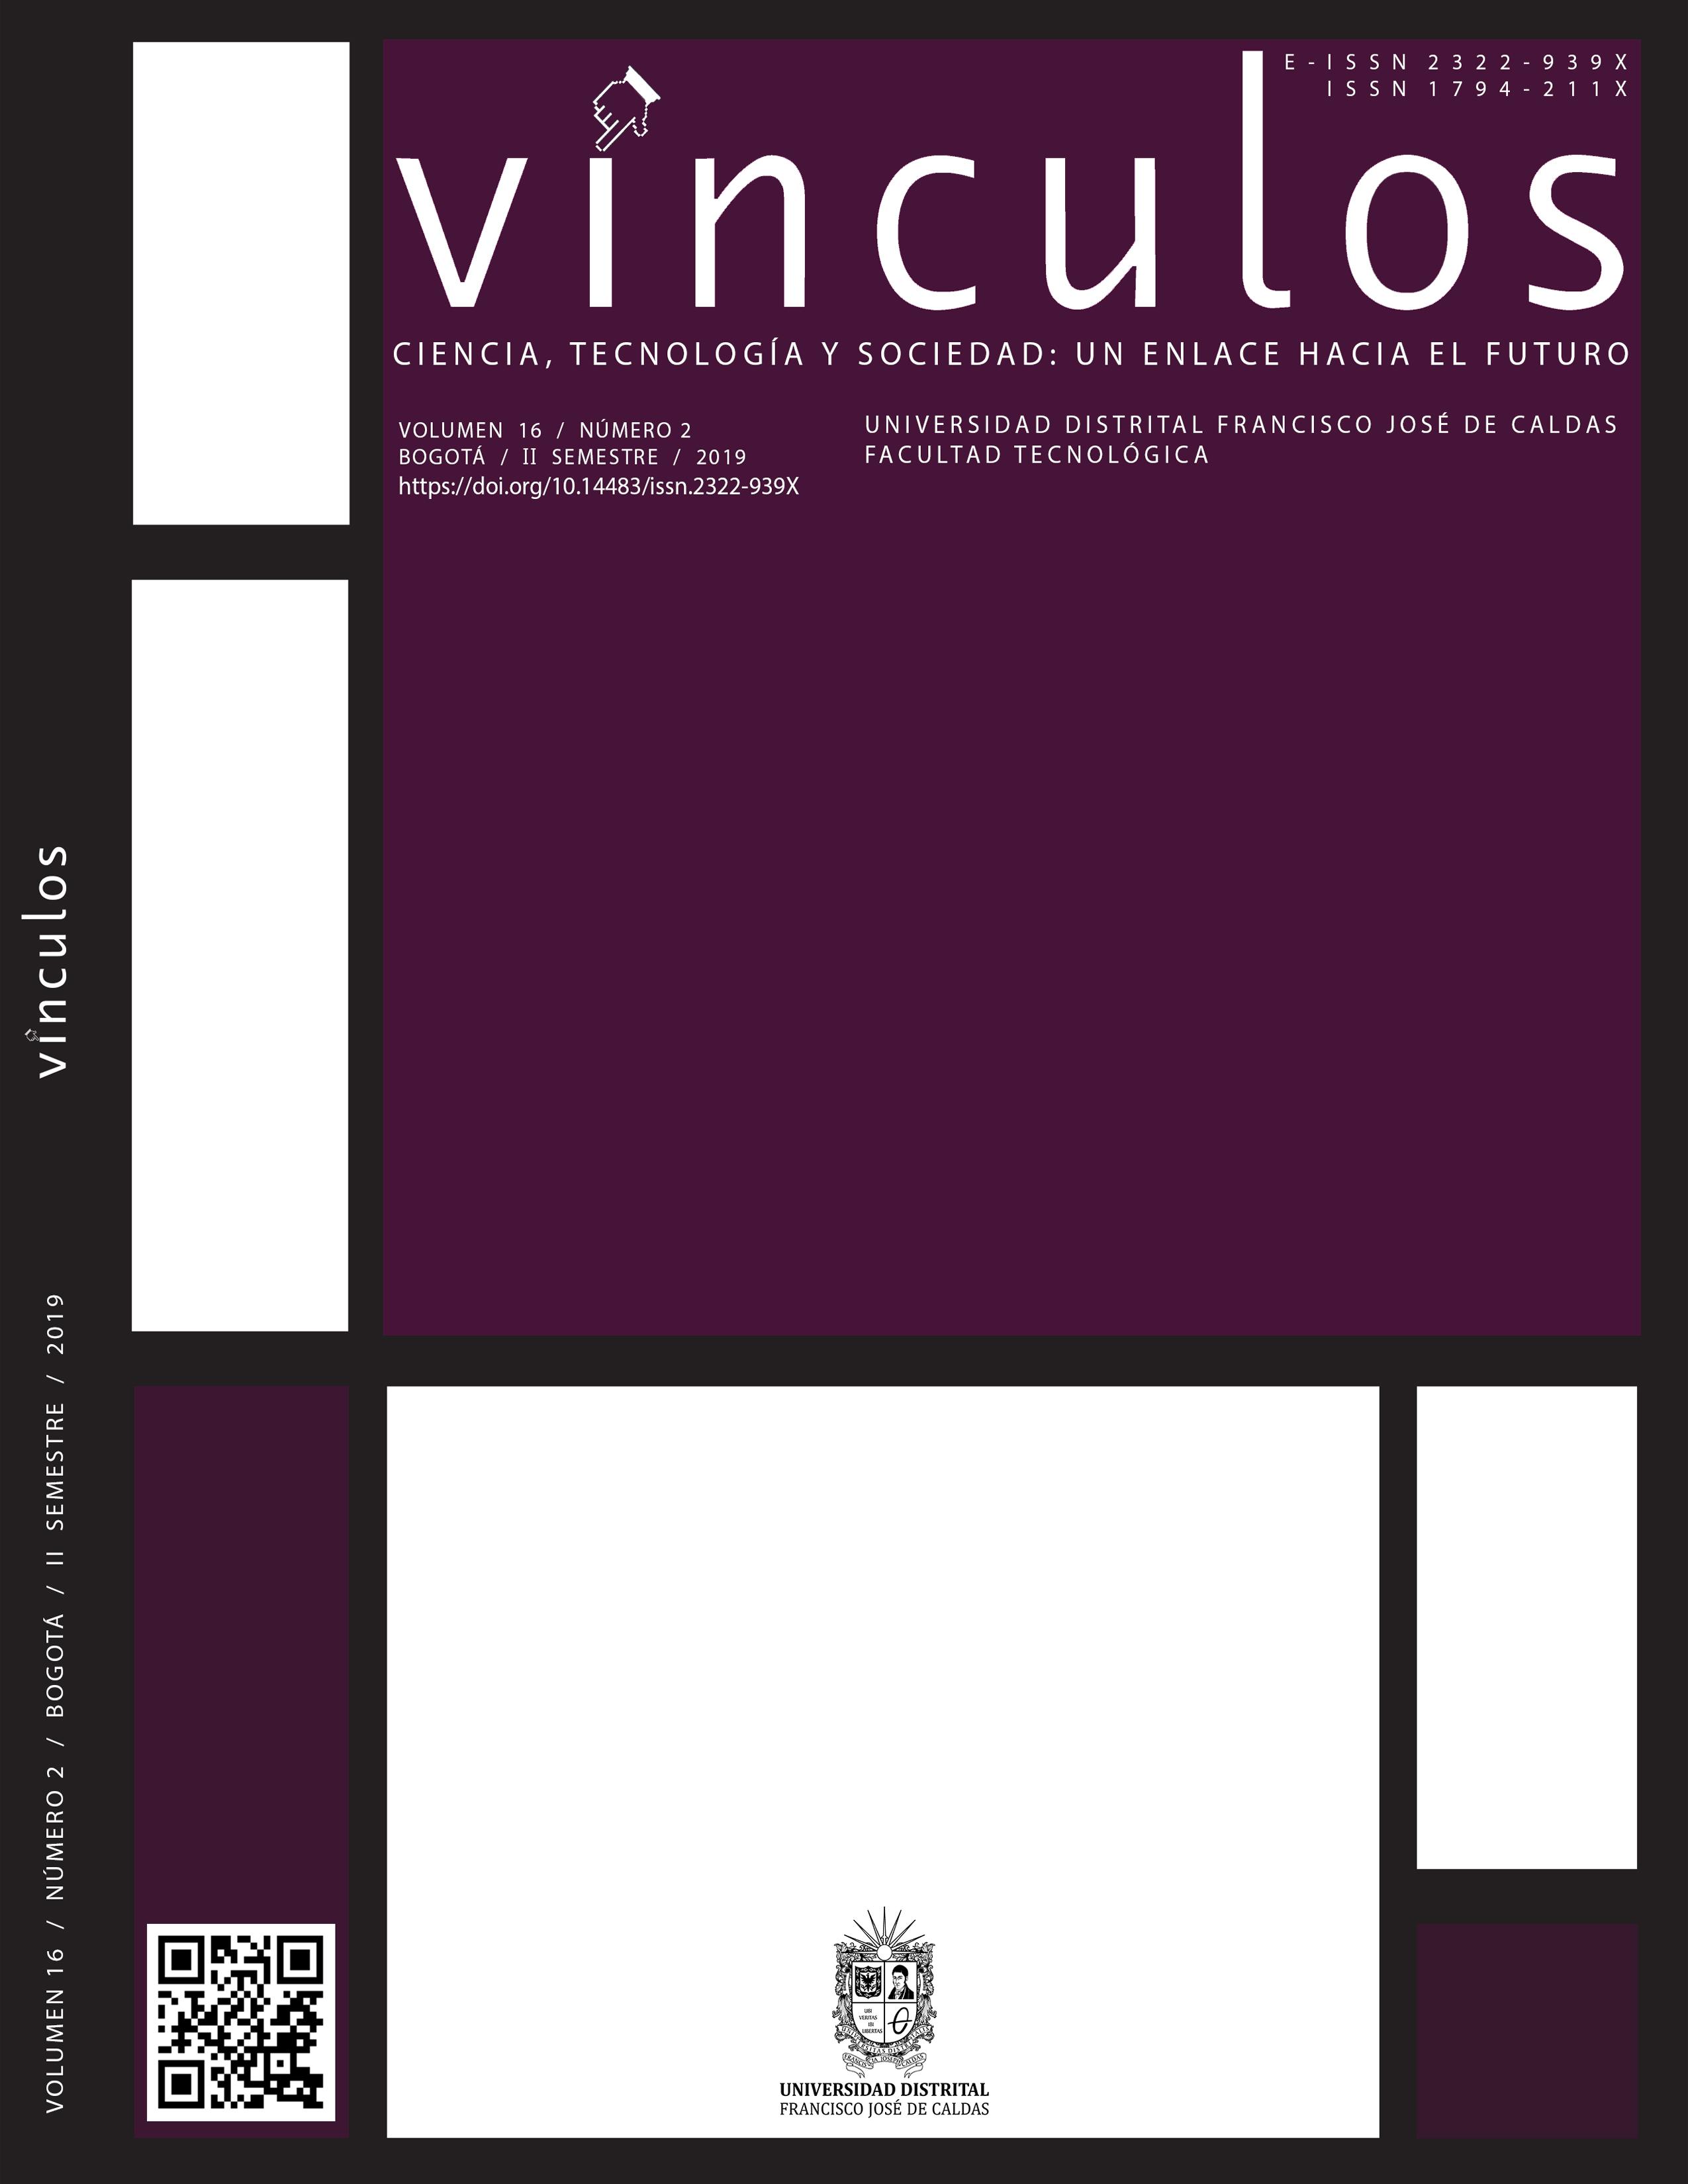 cover_issue_972_es_ES.jpg